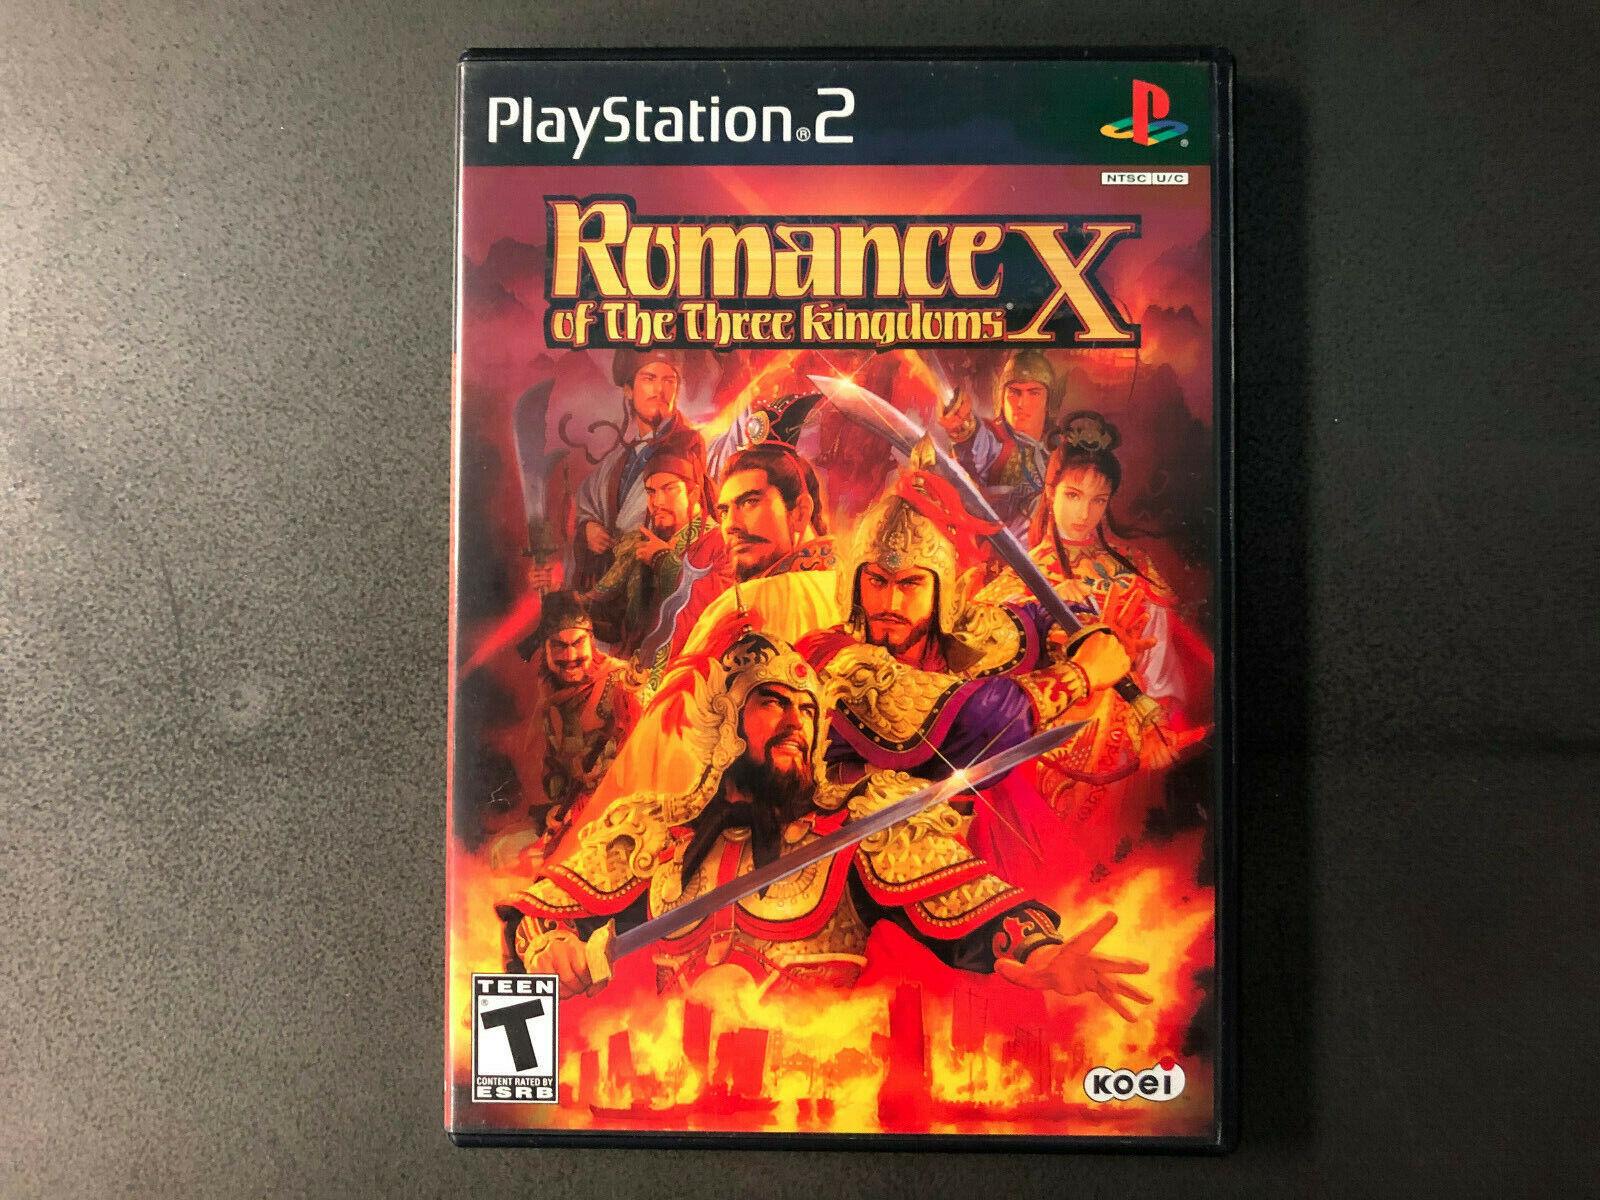 Romance Of The Three Kingdoms X Sony PlayStation 2 PS2, 2005 CIB RARE Tested  - $24.50